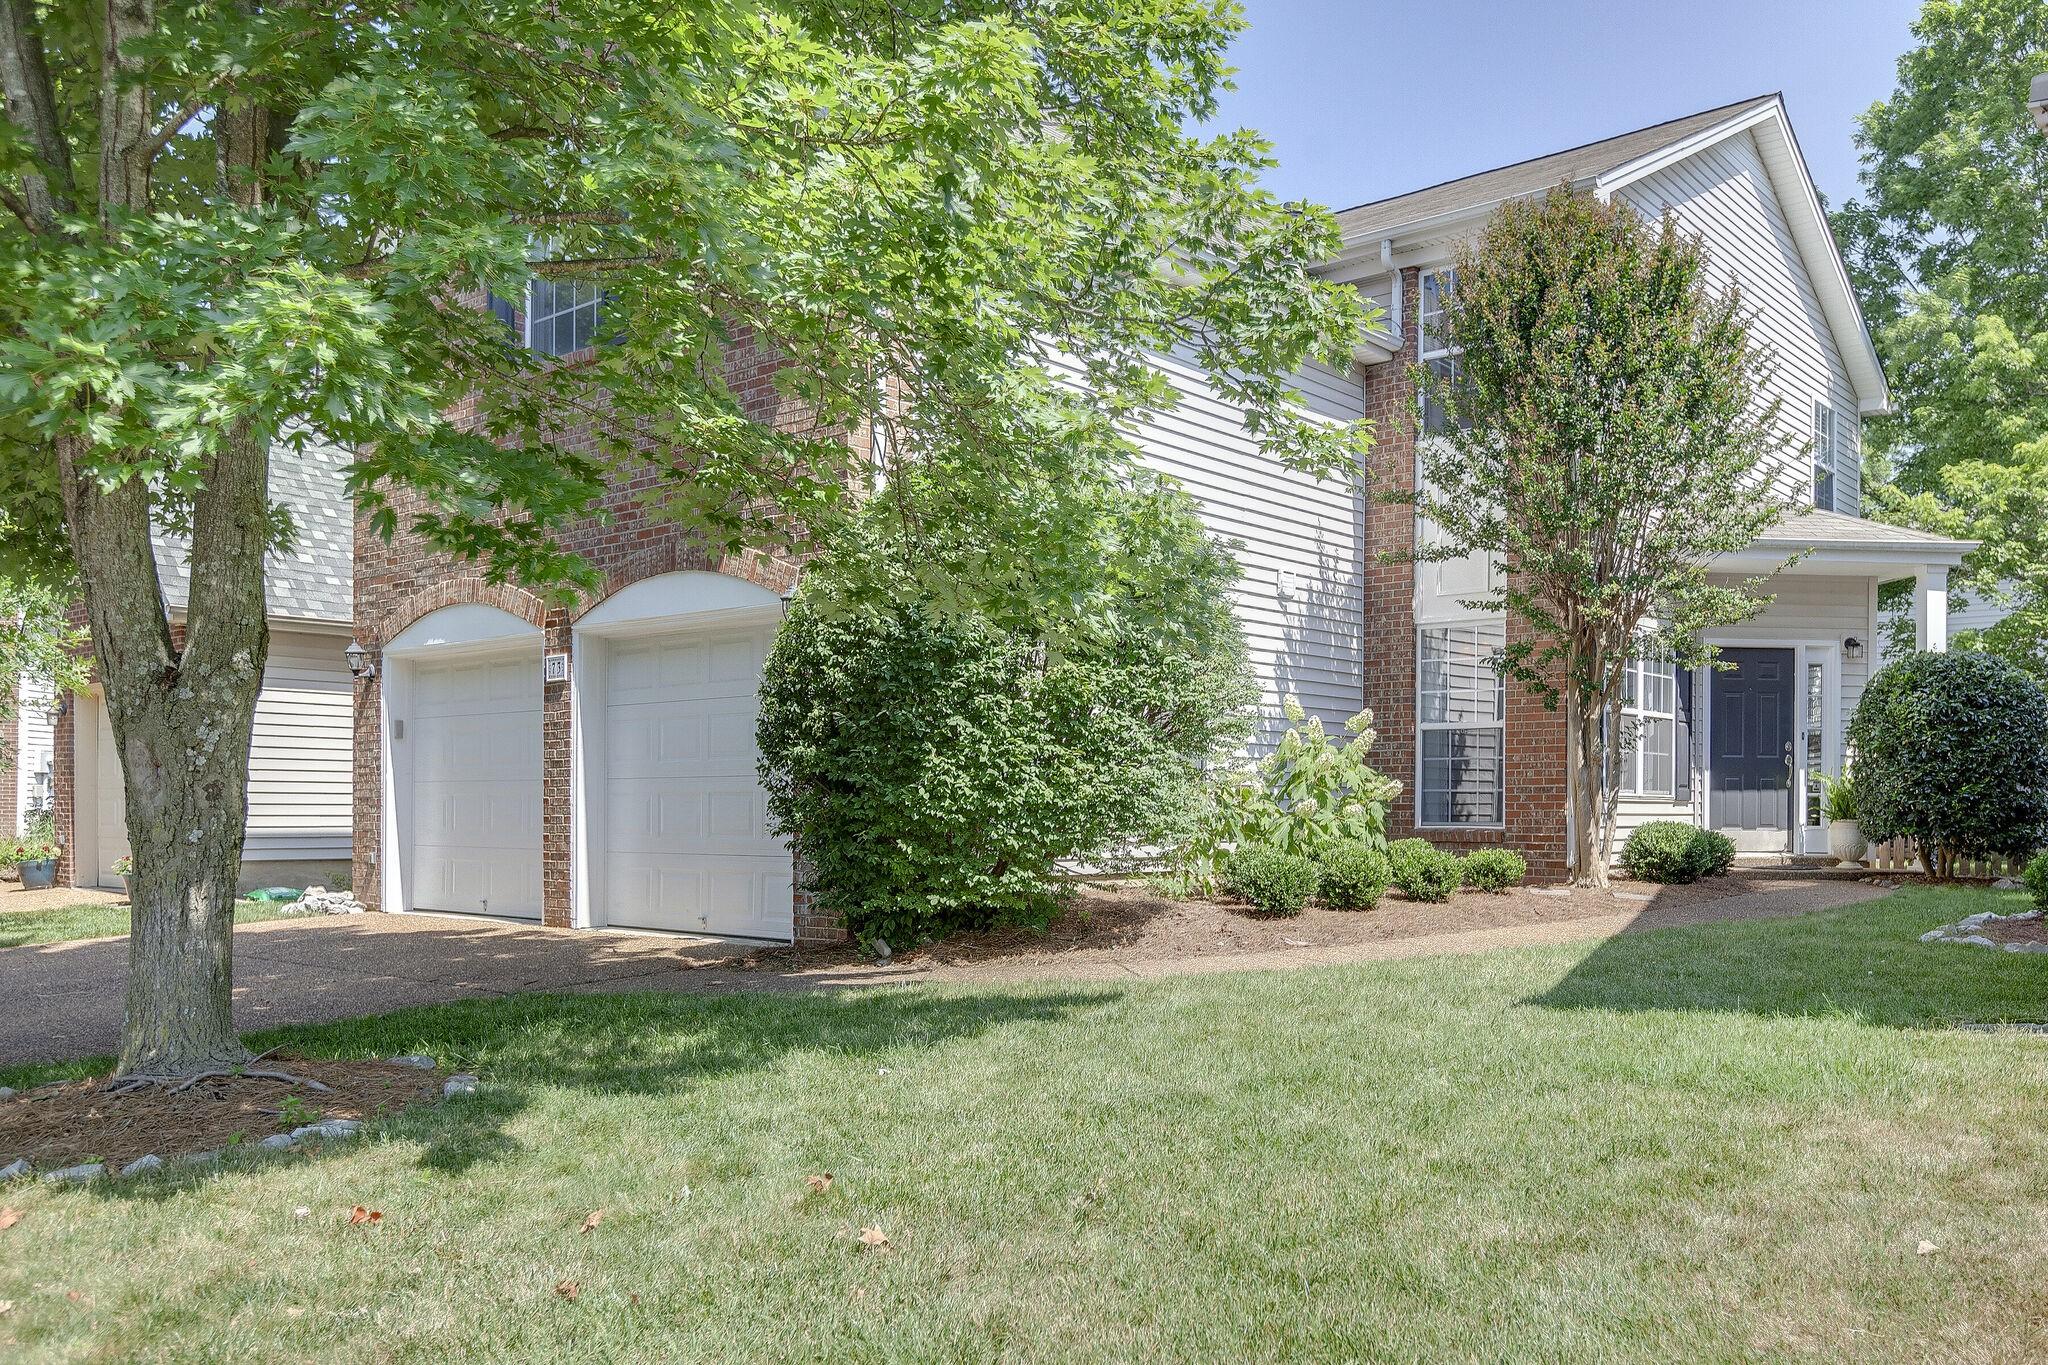 73 Cromford Pl Property Photo - Franklin, TN real estate listing